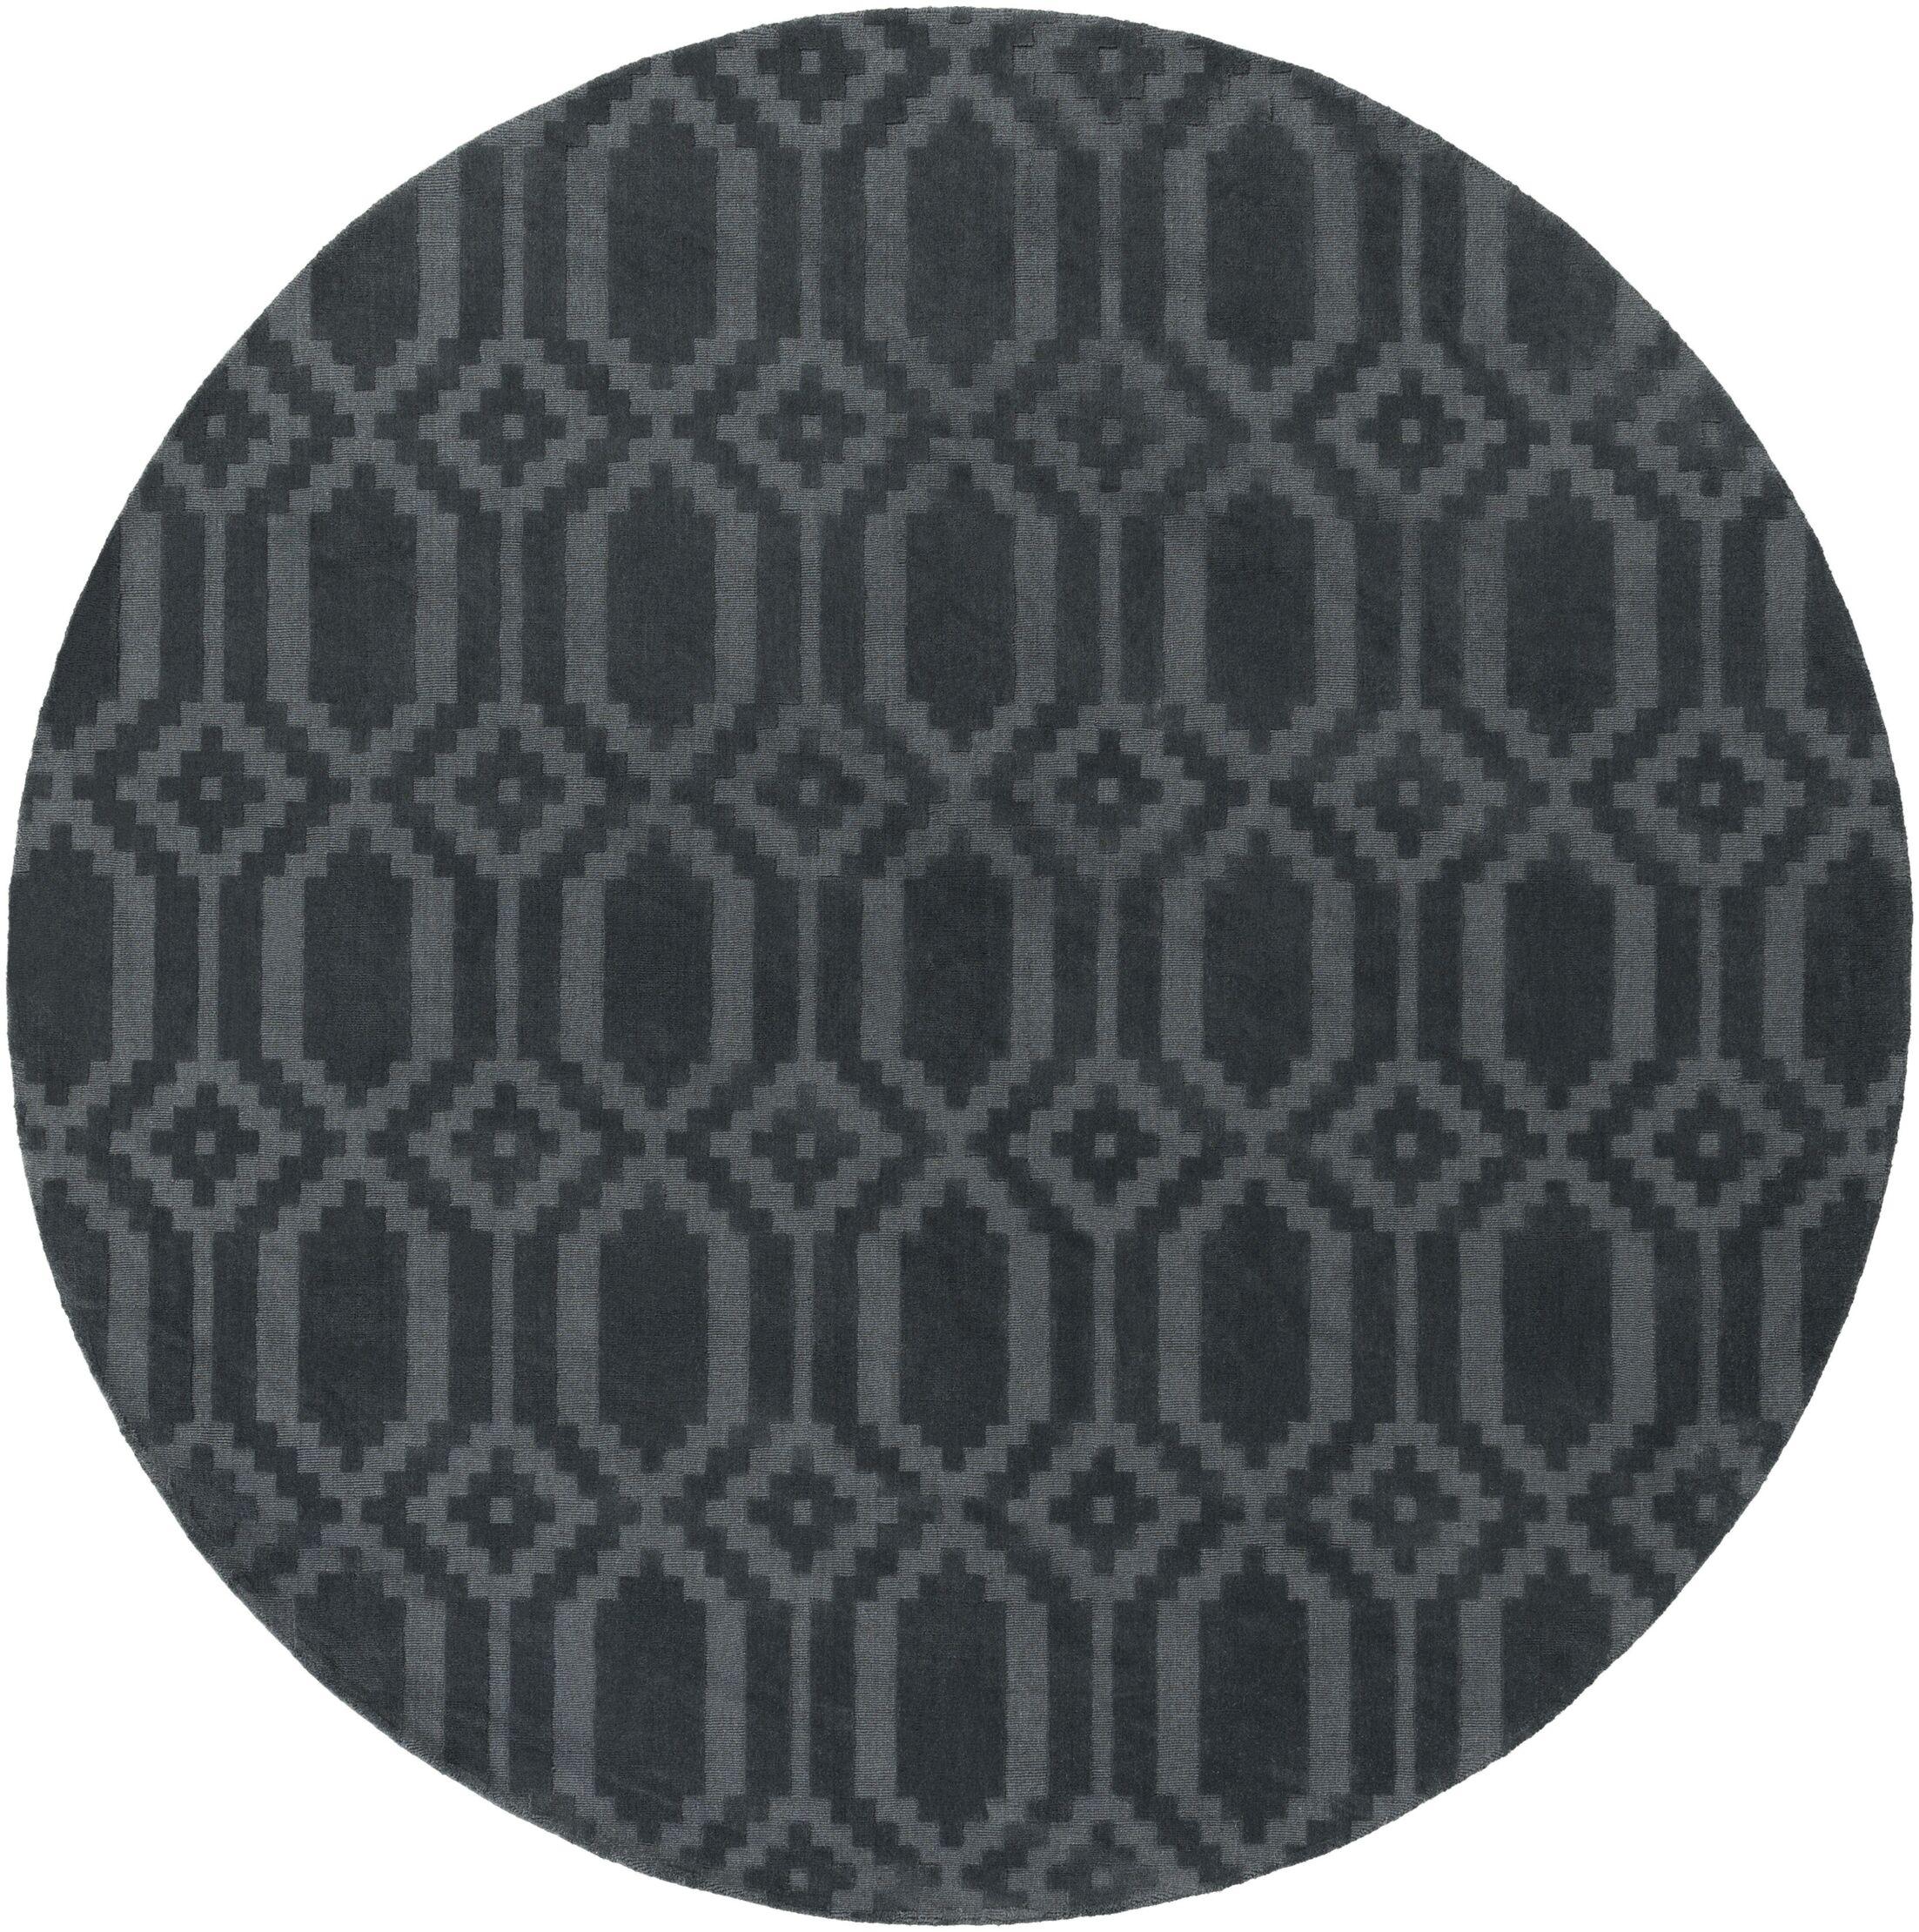 Brack Hand-Loomed Denim Area Rug Rug Size: Round 9'9